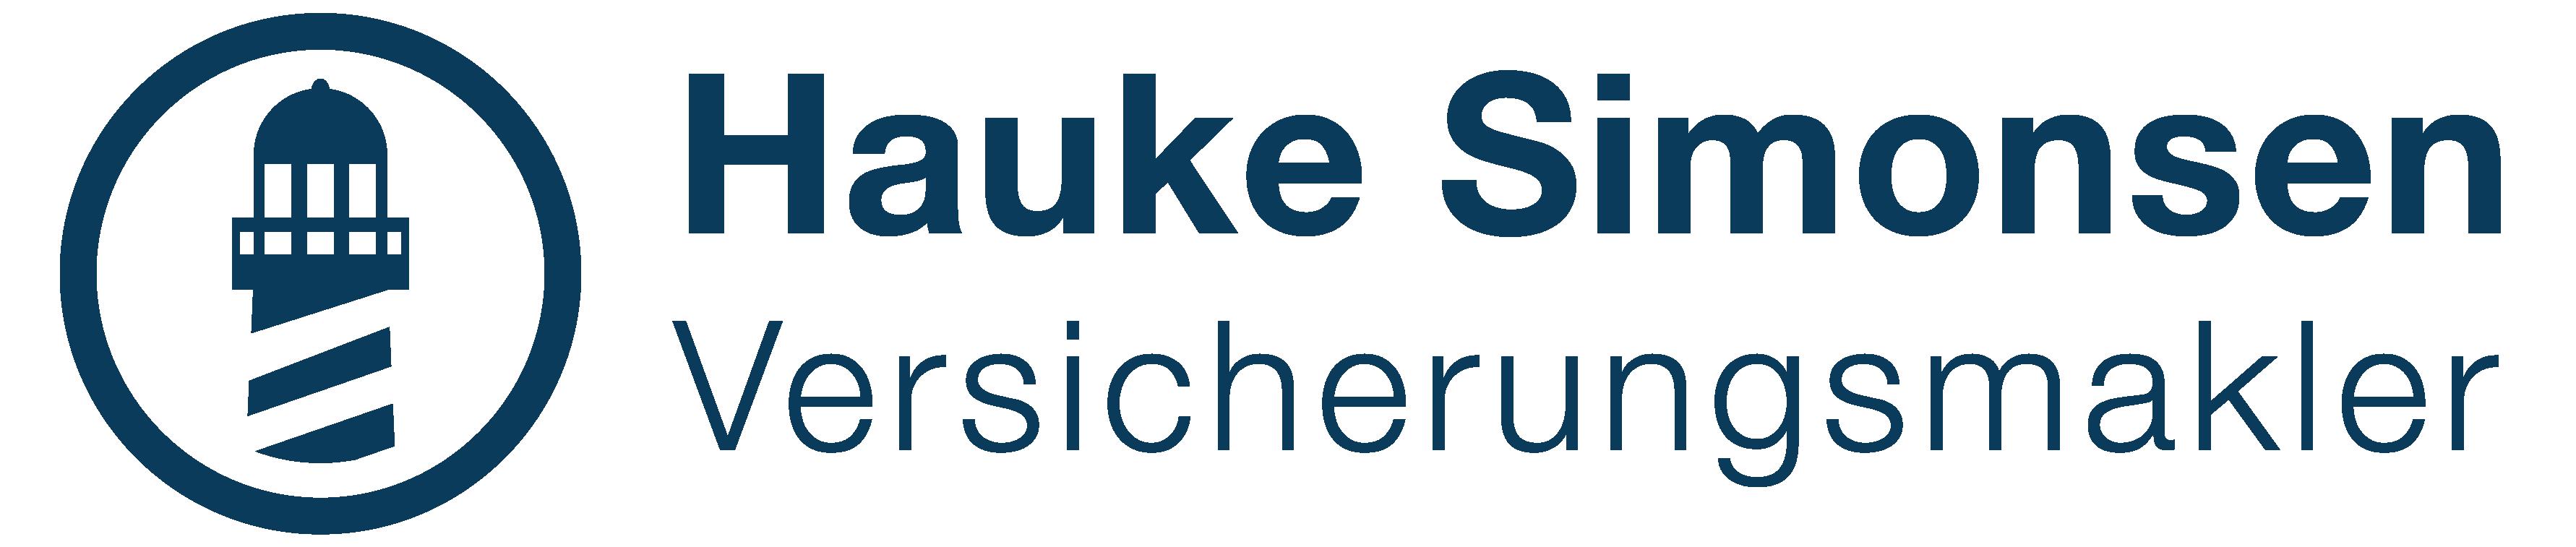 Hauke Simonsen Versicherungsmakler Hamburg Logo